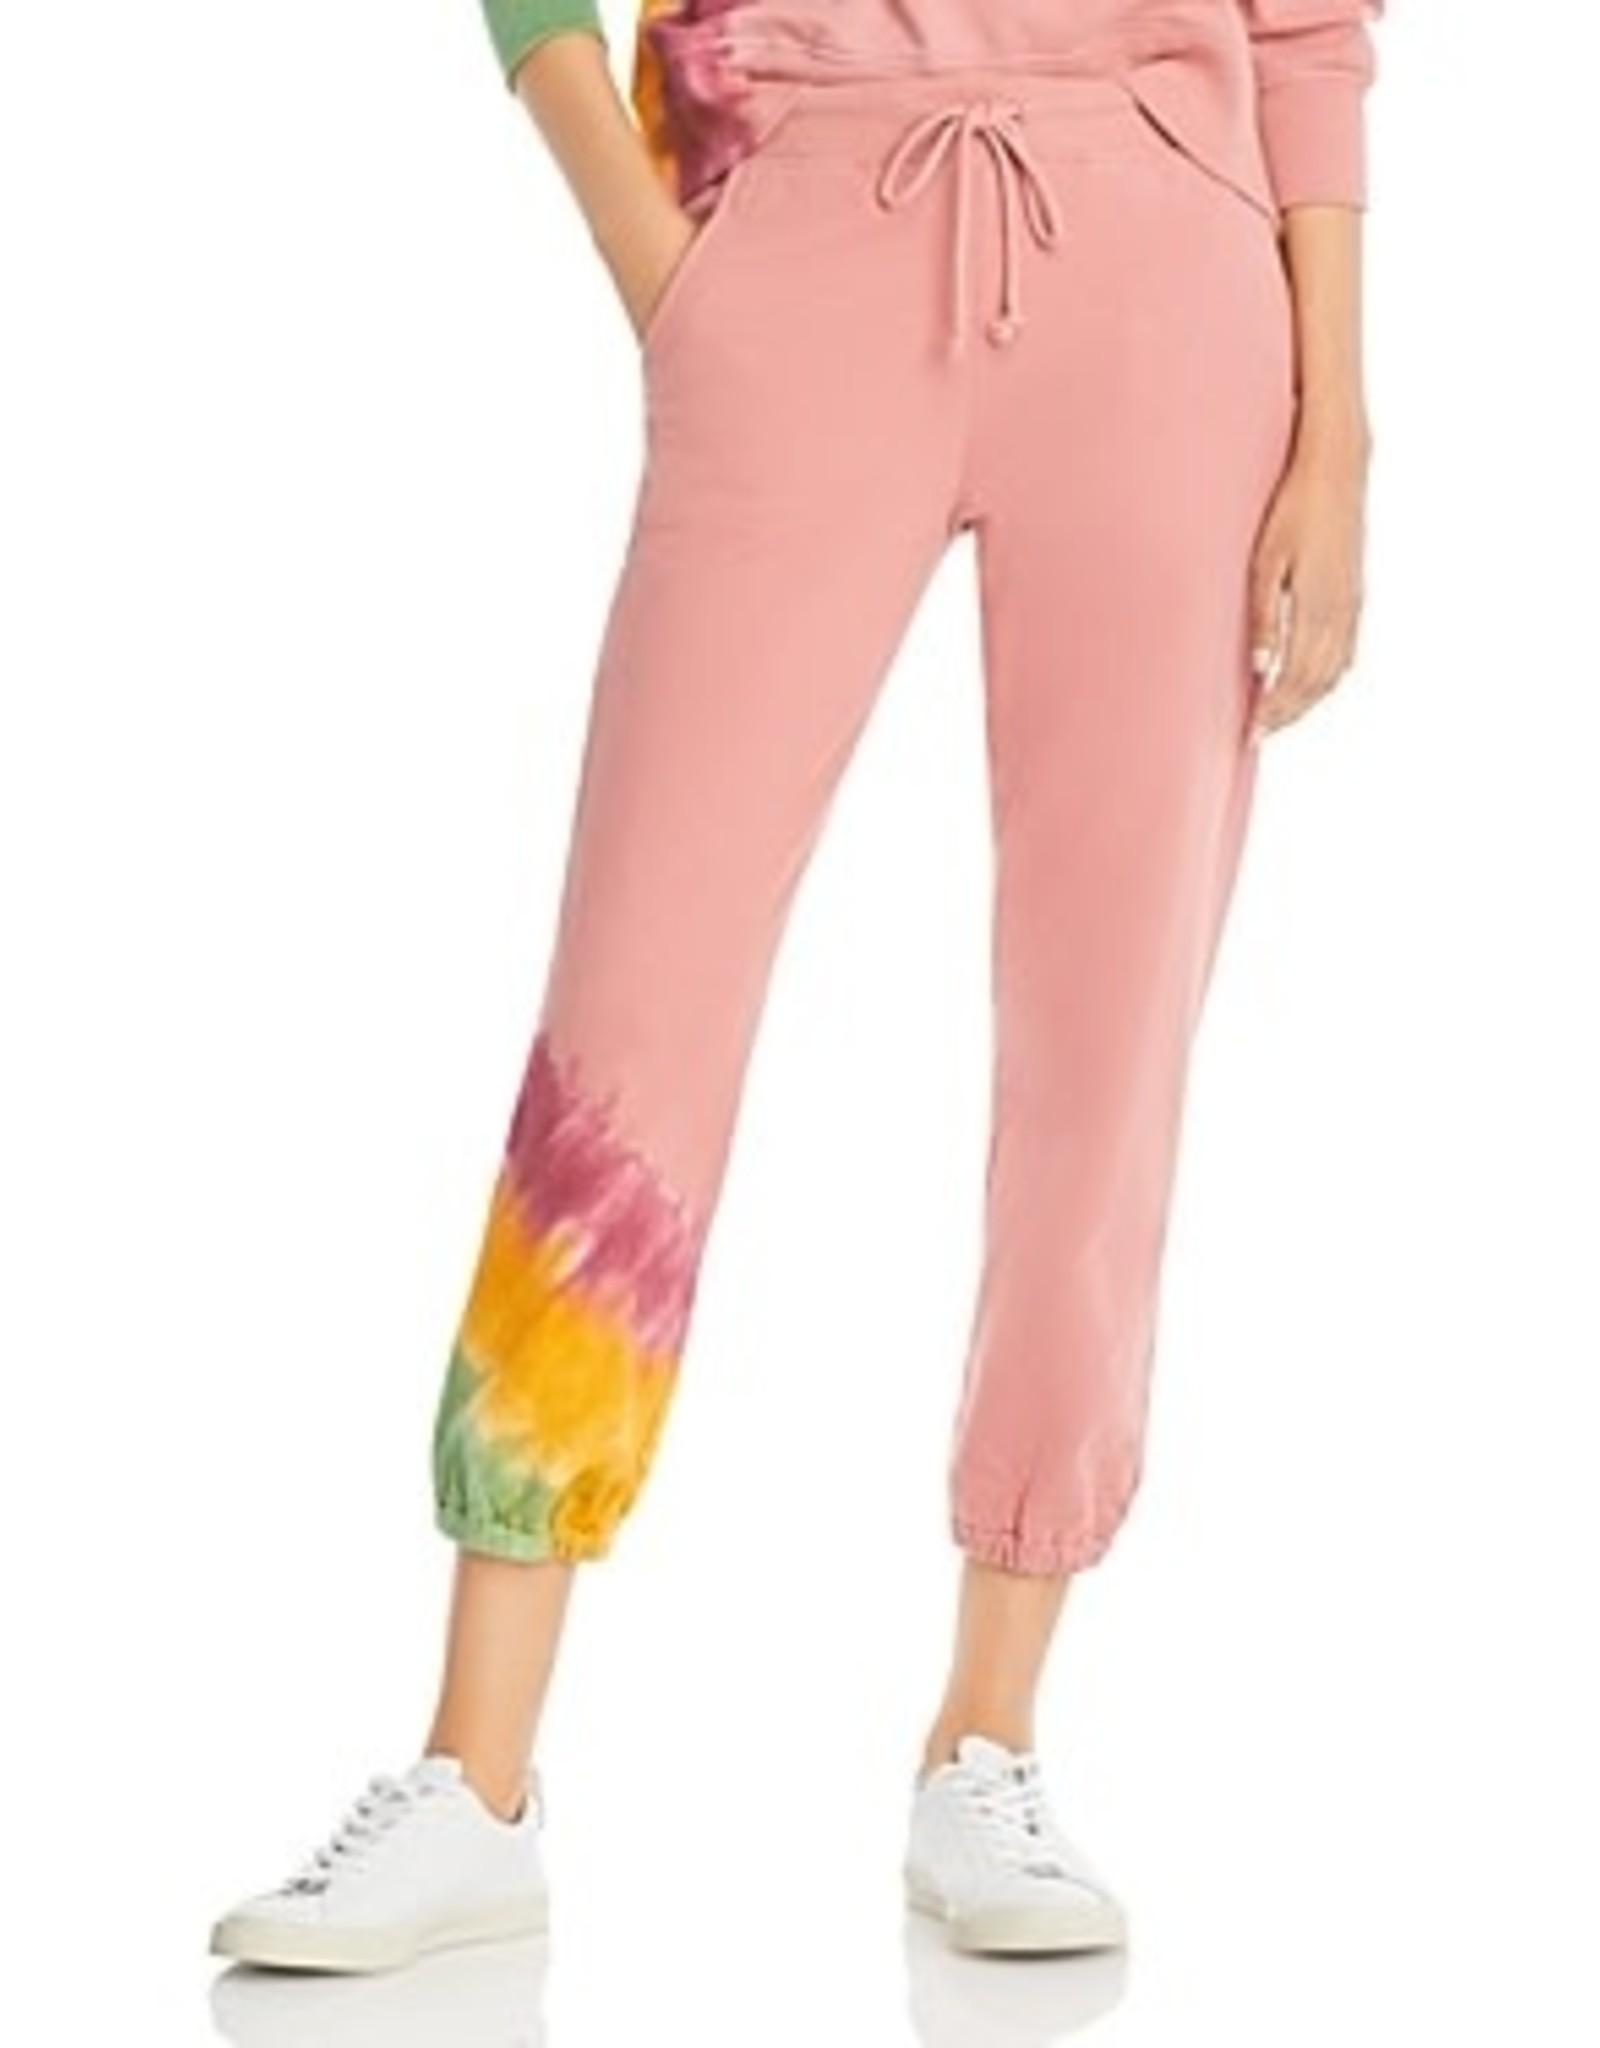 Velvet Nissa 04 Tie Dye Sweatpants Sz Small